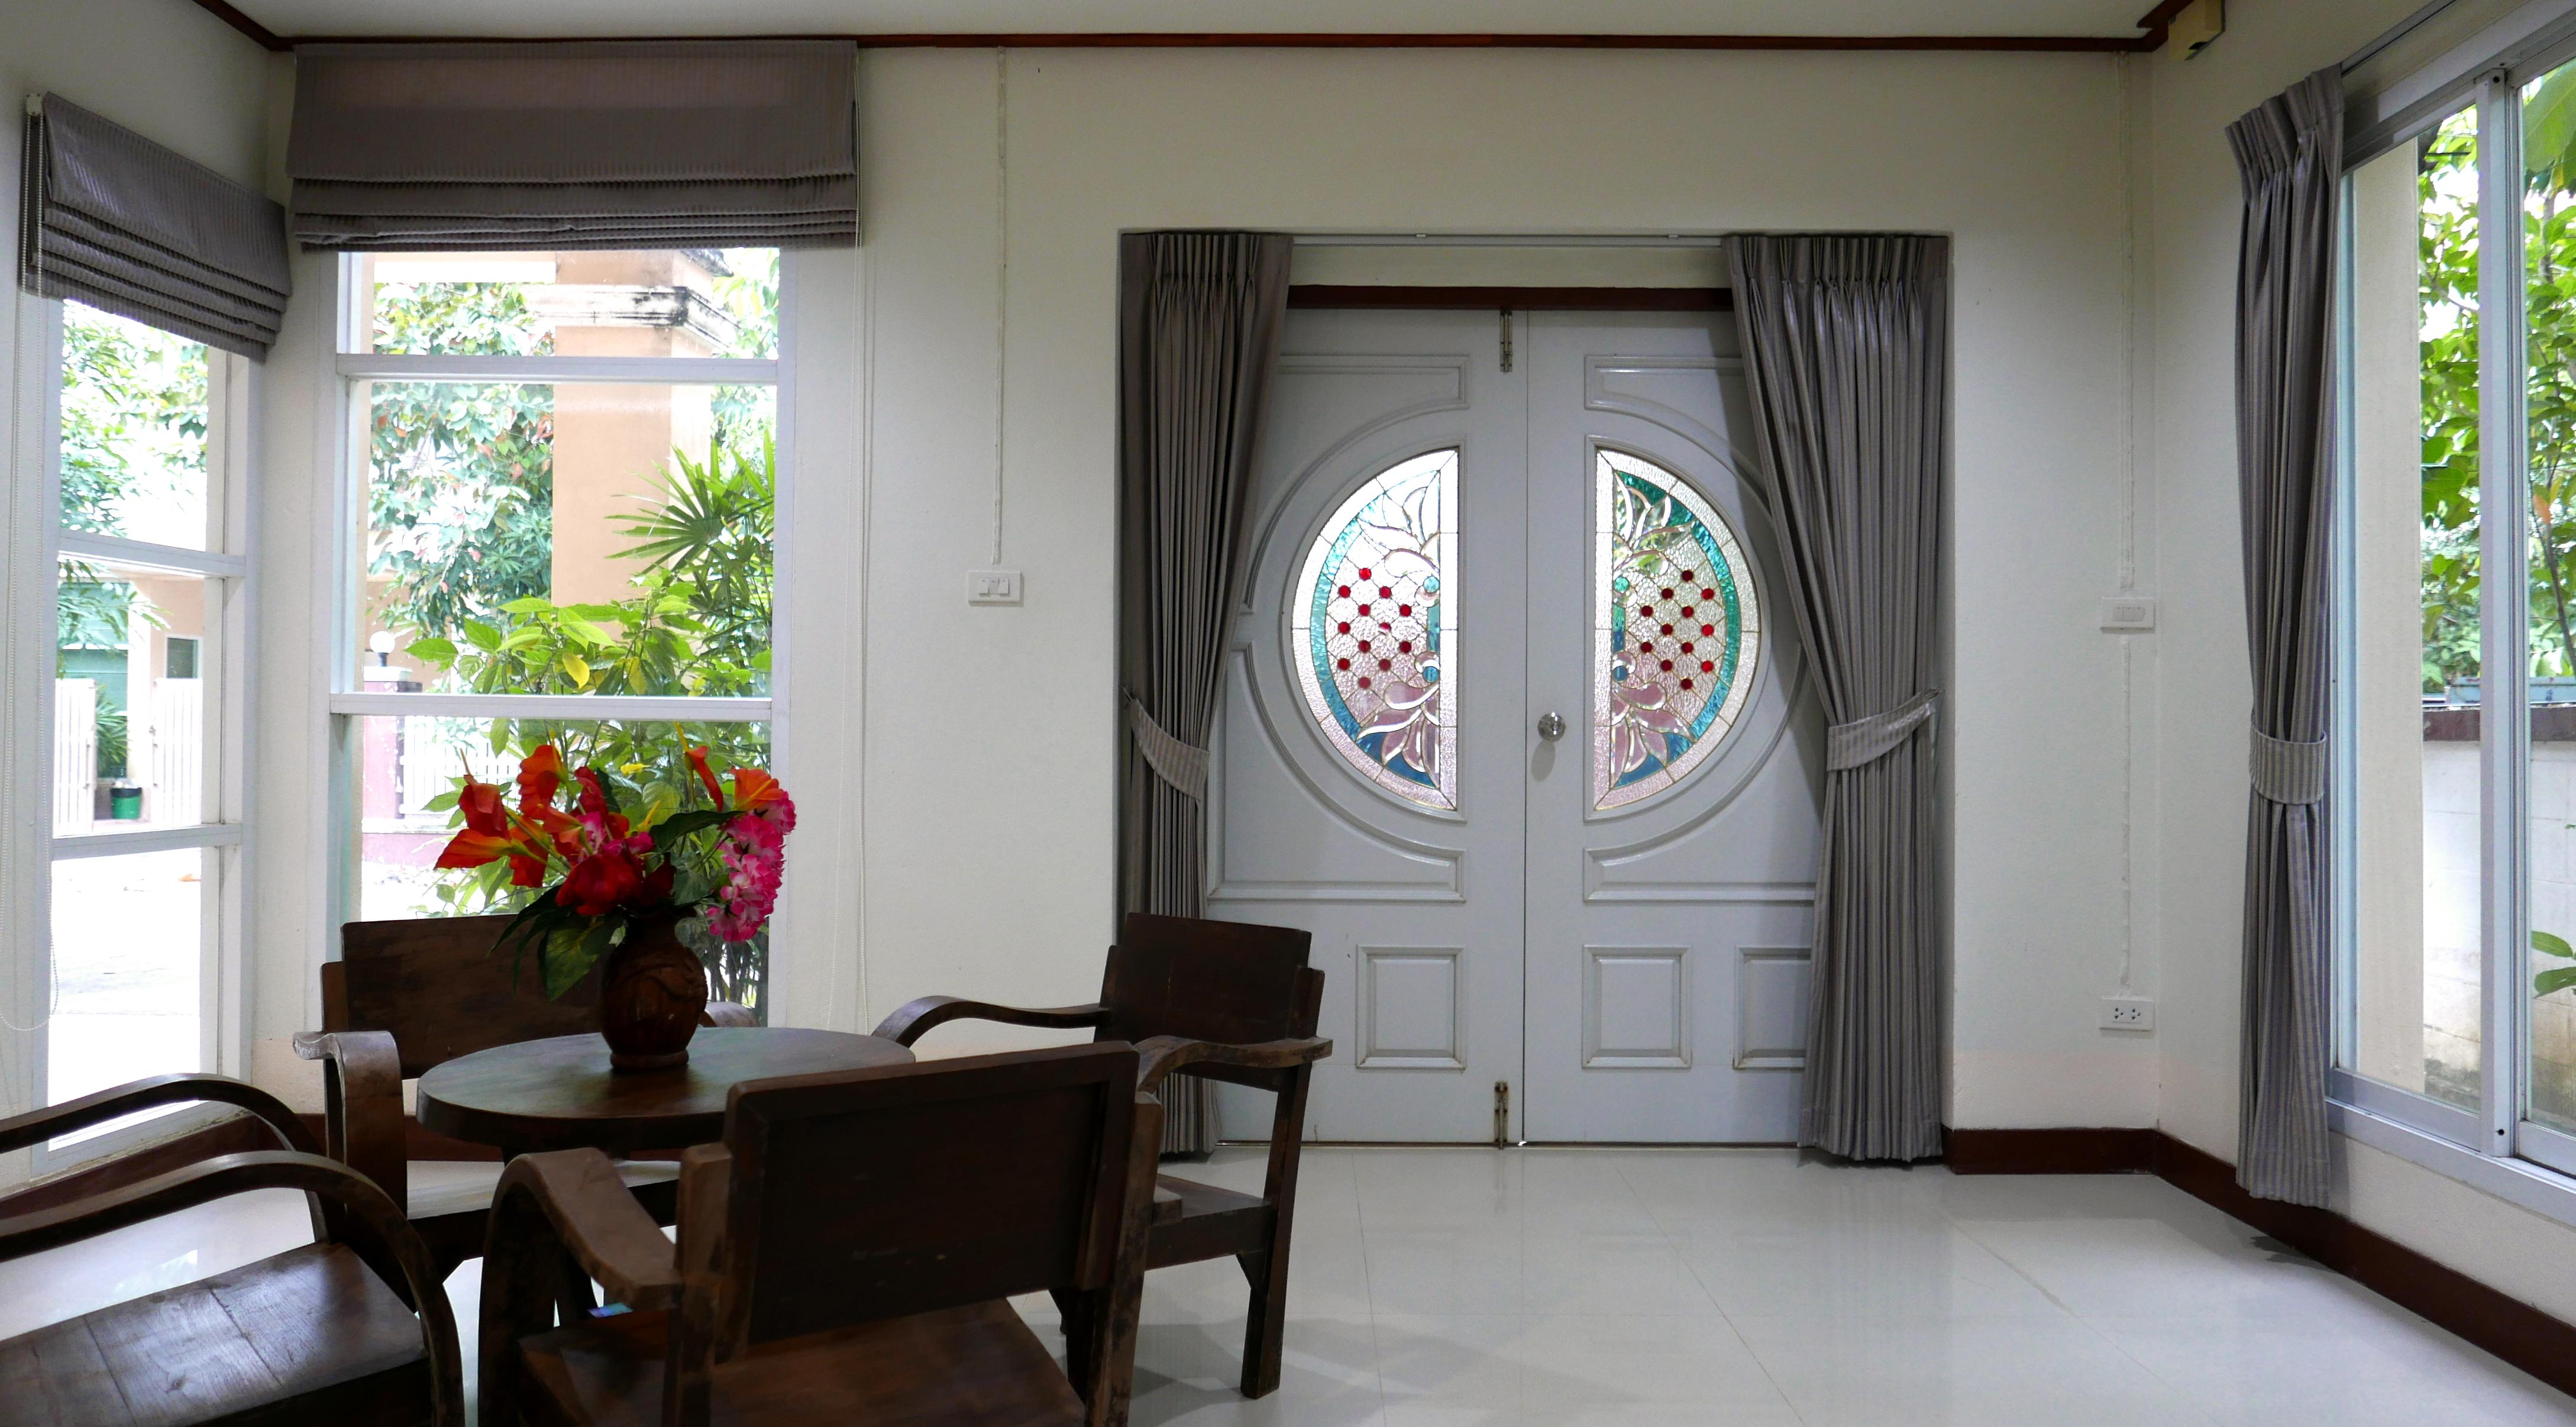 Kamalar palace dining room 2